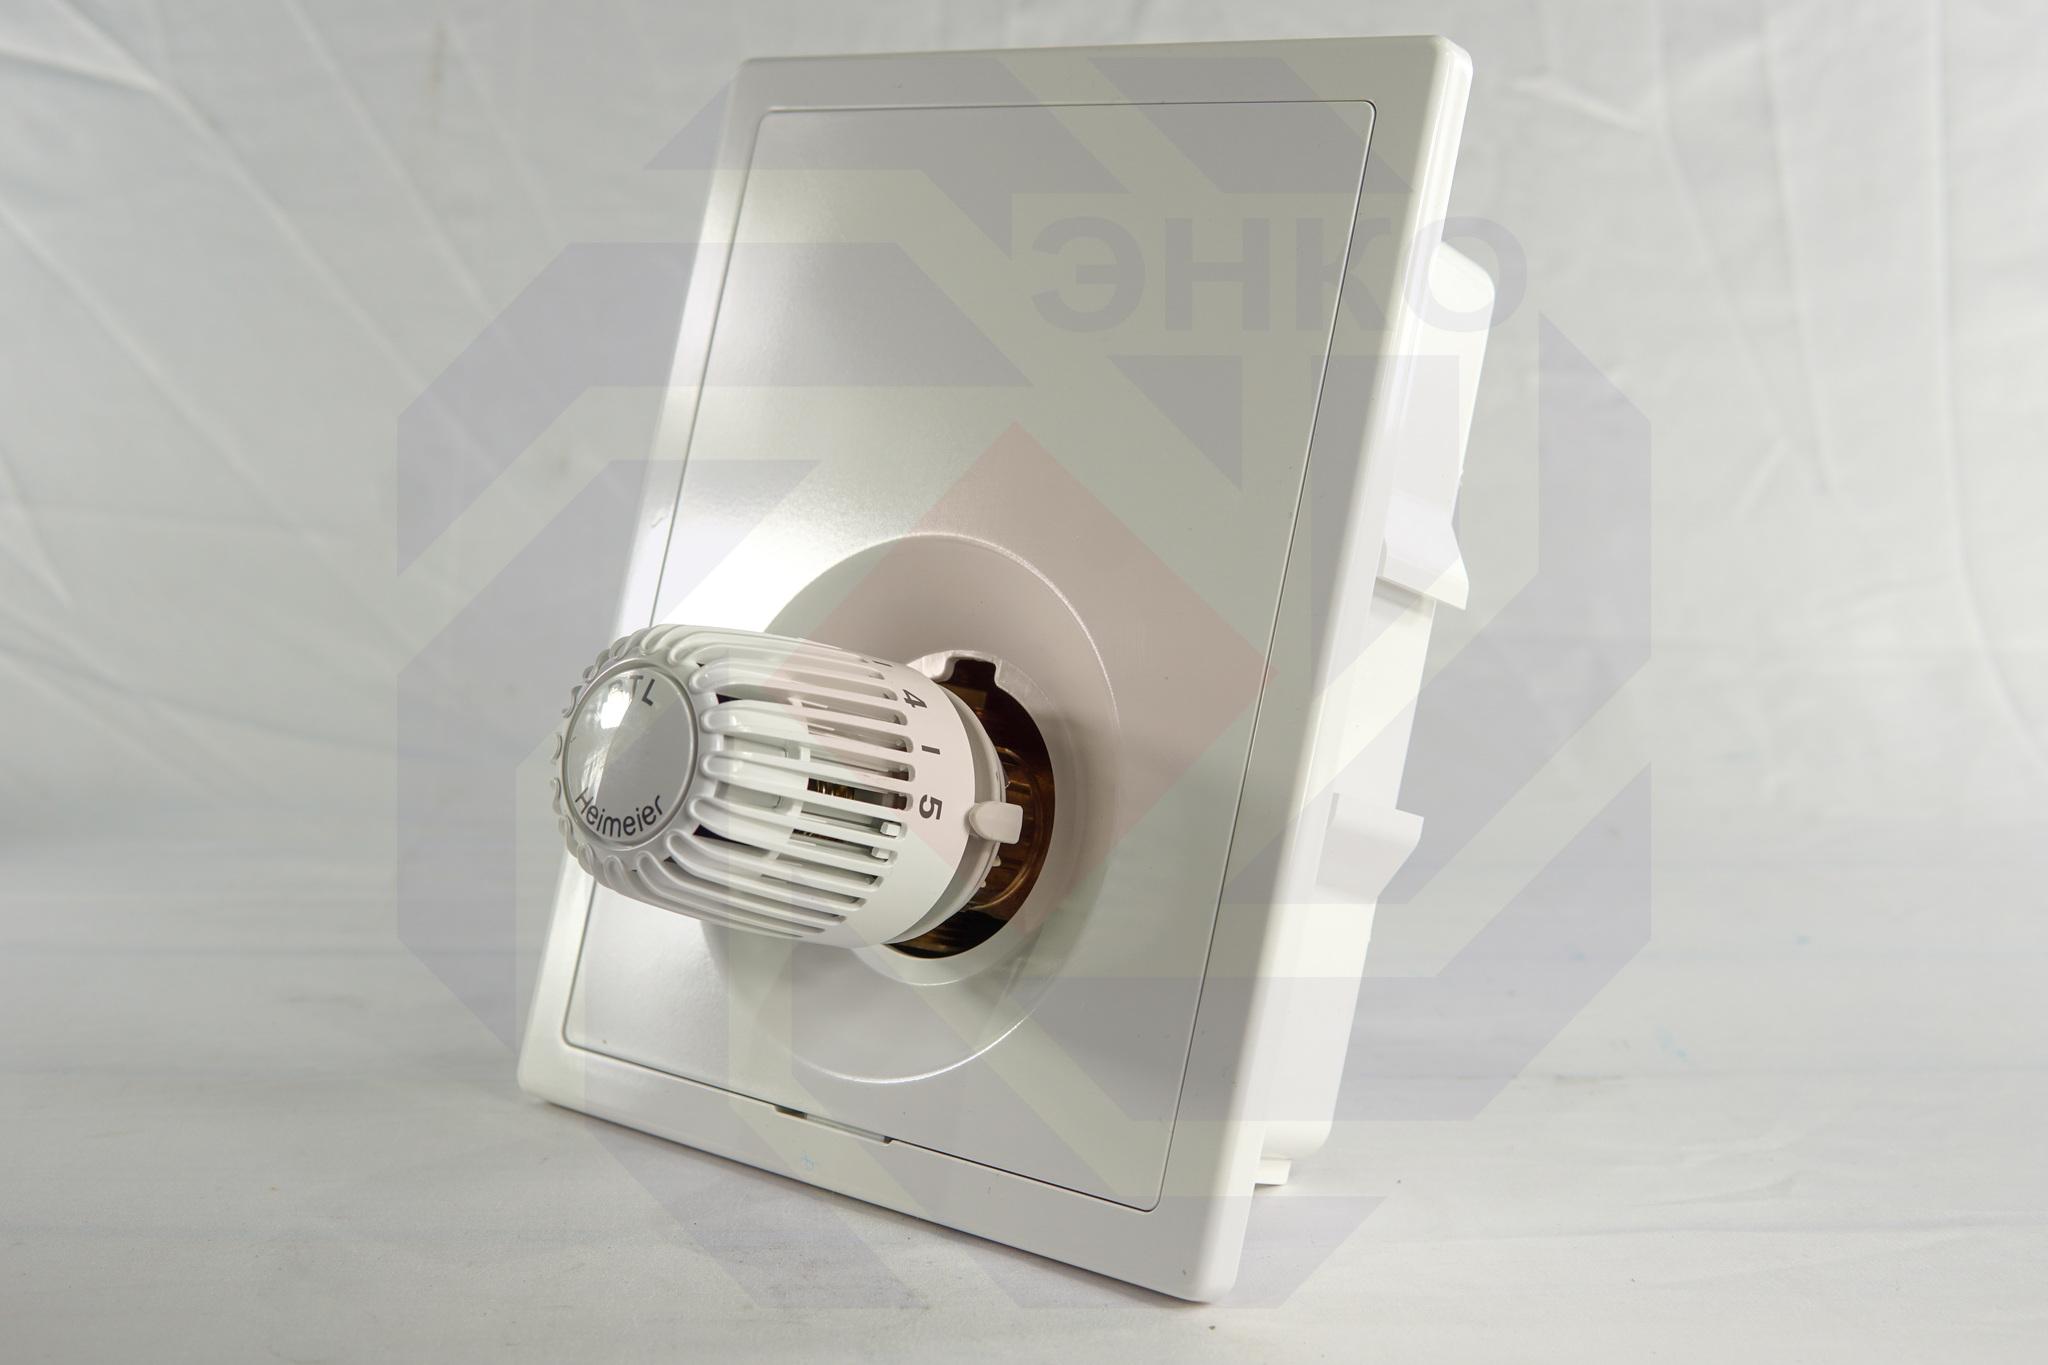 Регулятор температуры для теплых полов IMI Multibox RTL